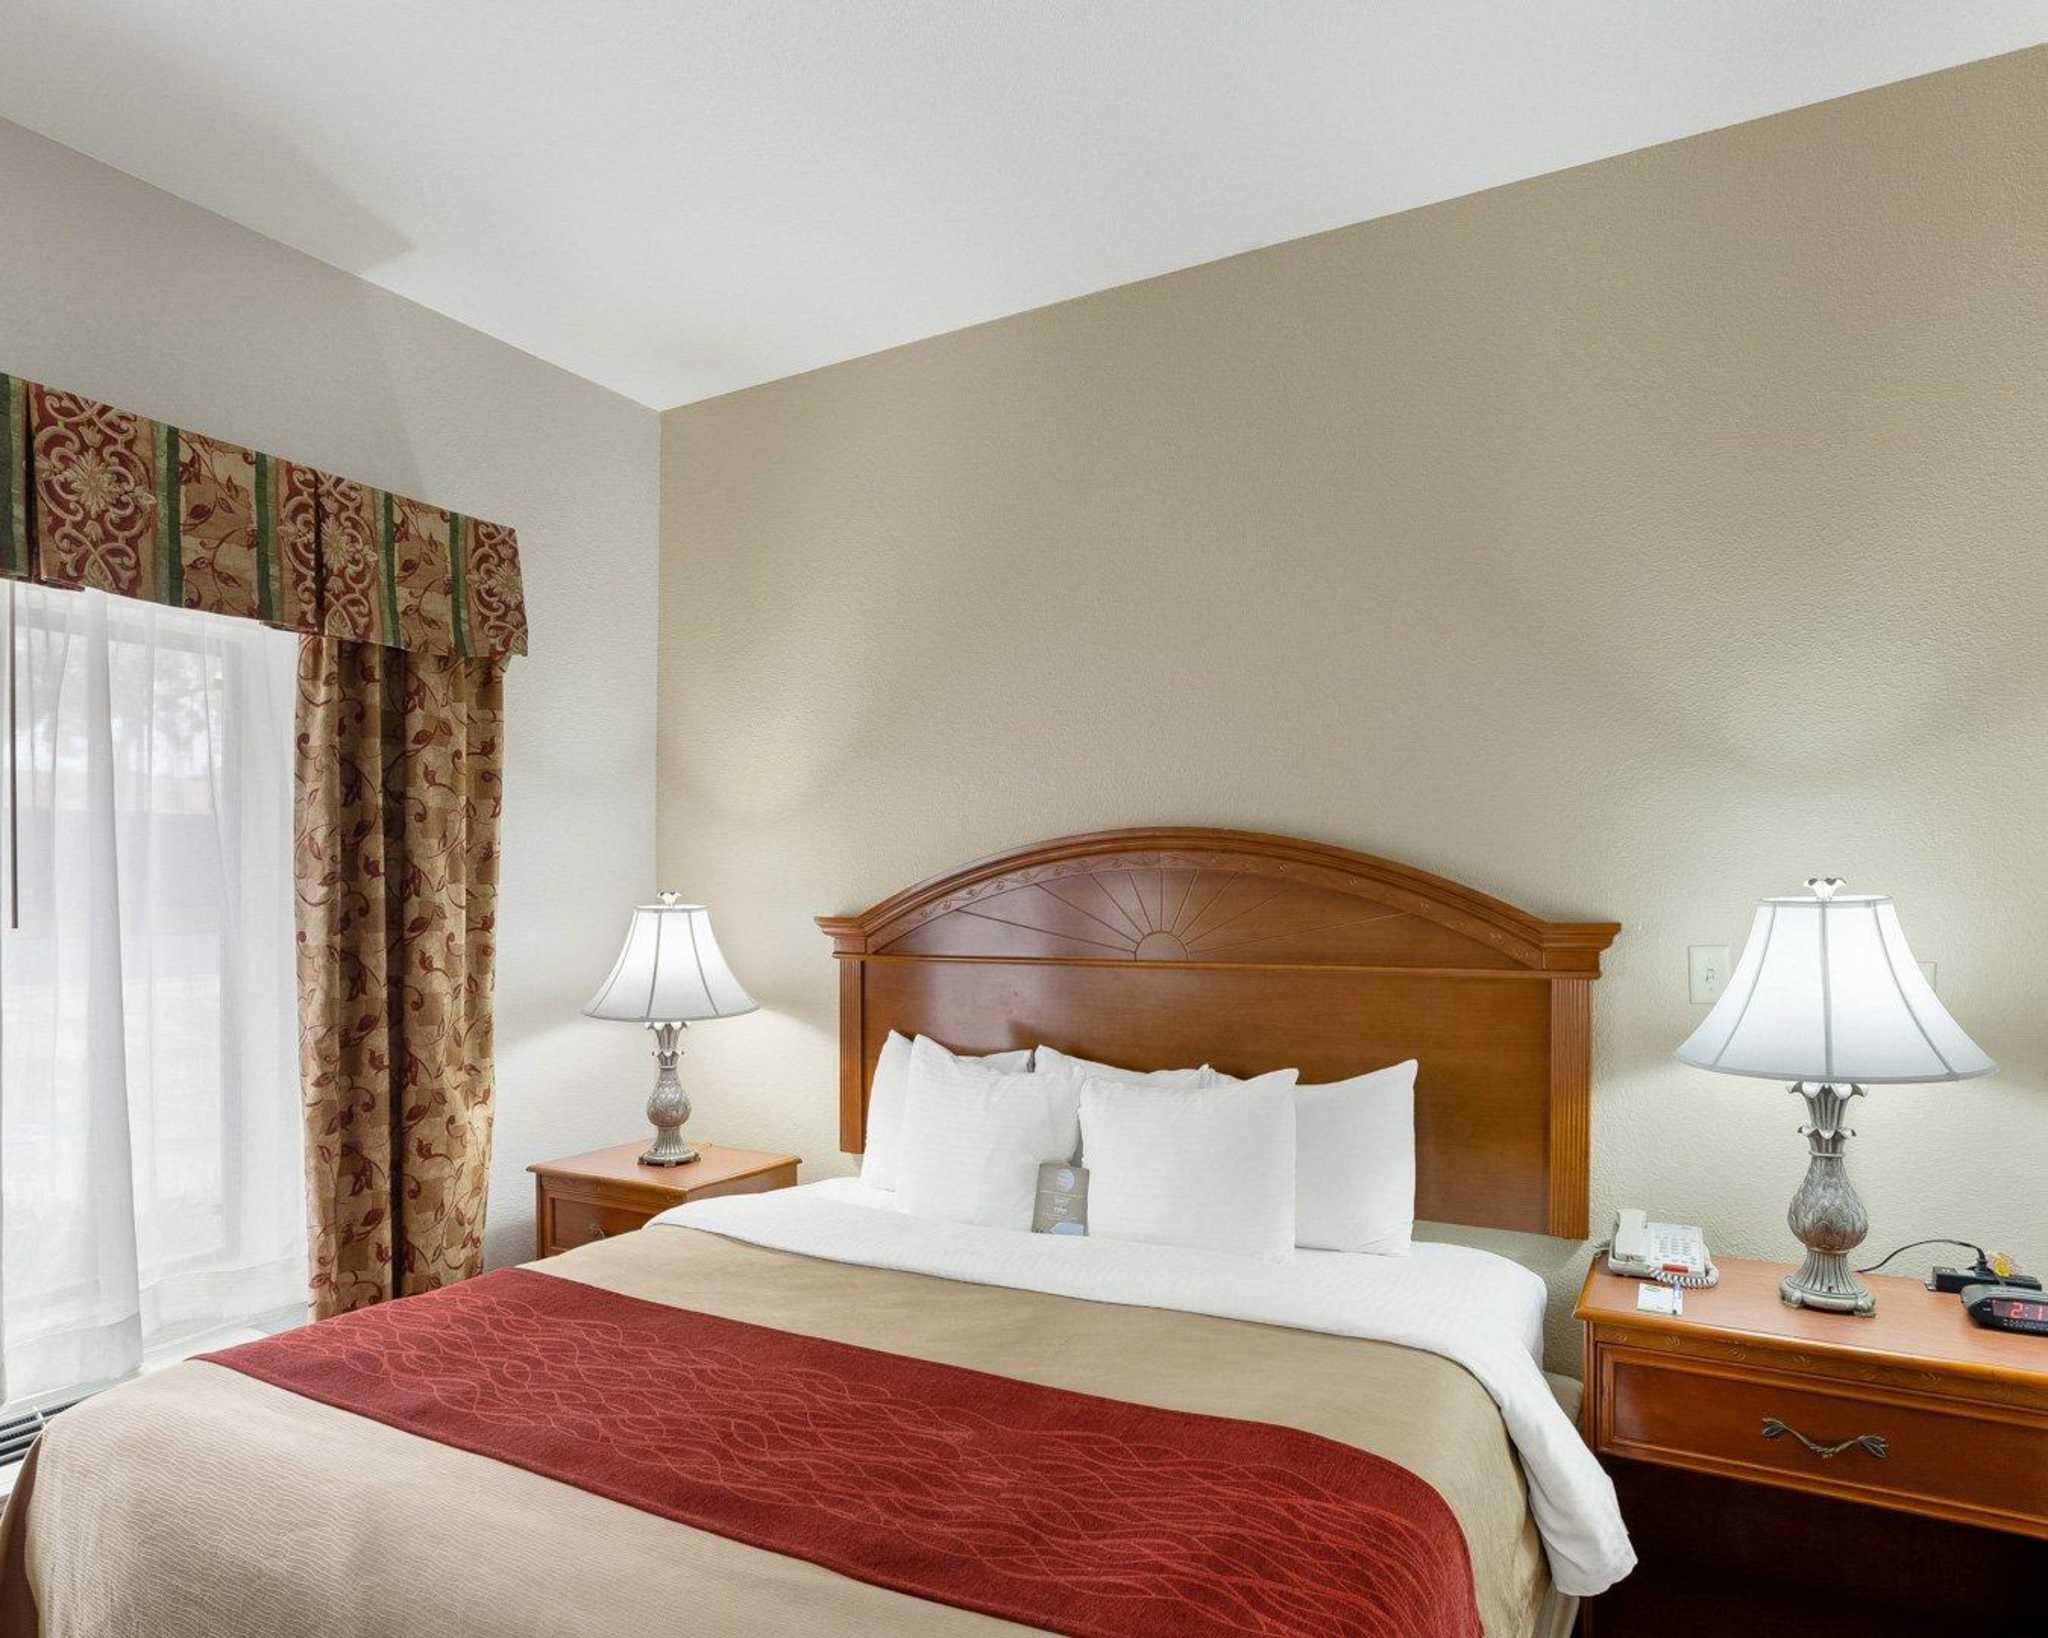 Comfort Inn & Suites Near Medical Center image 18